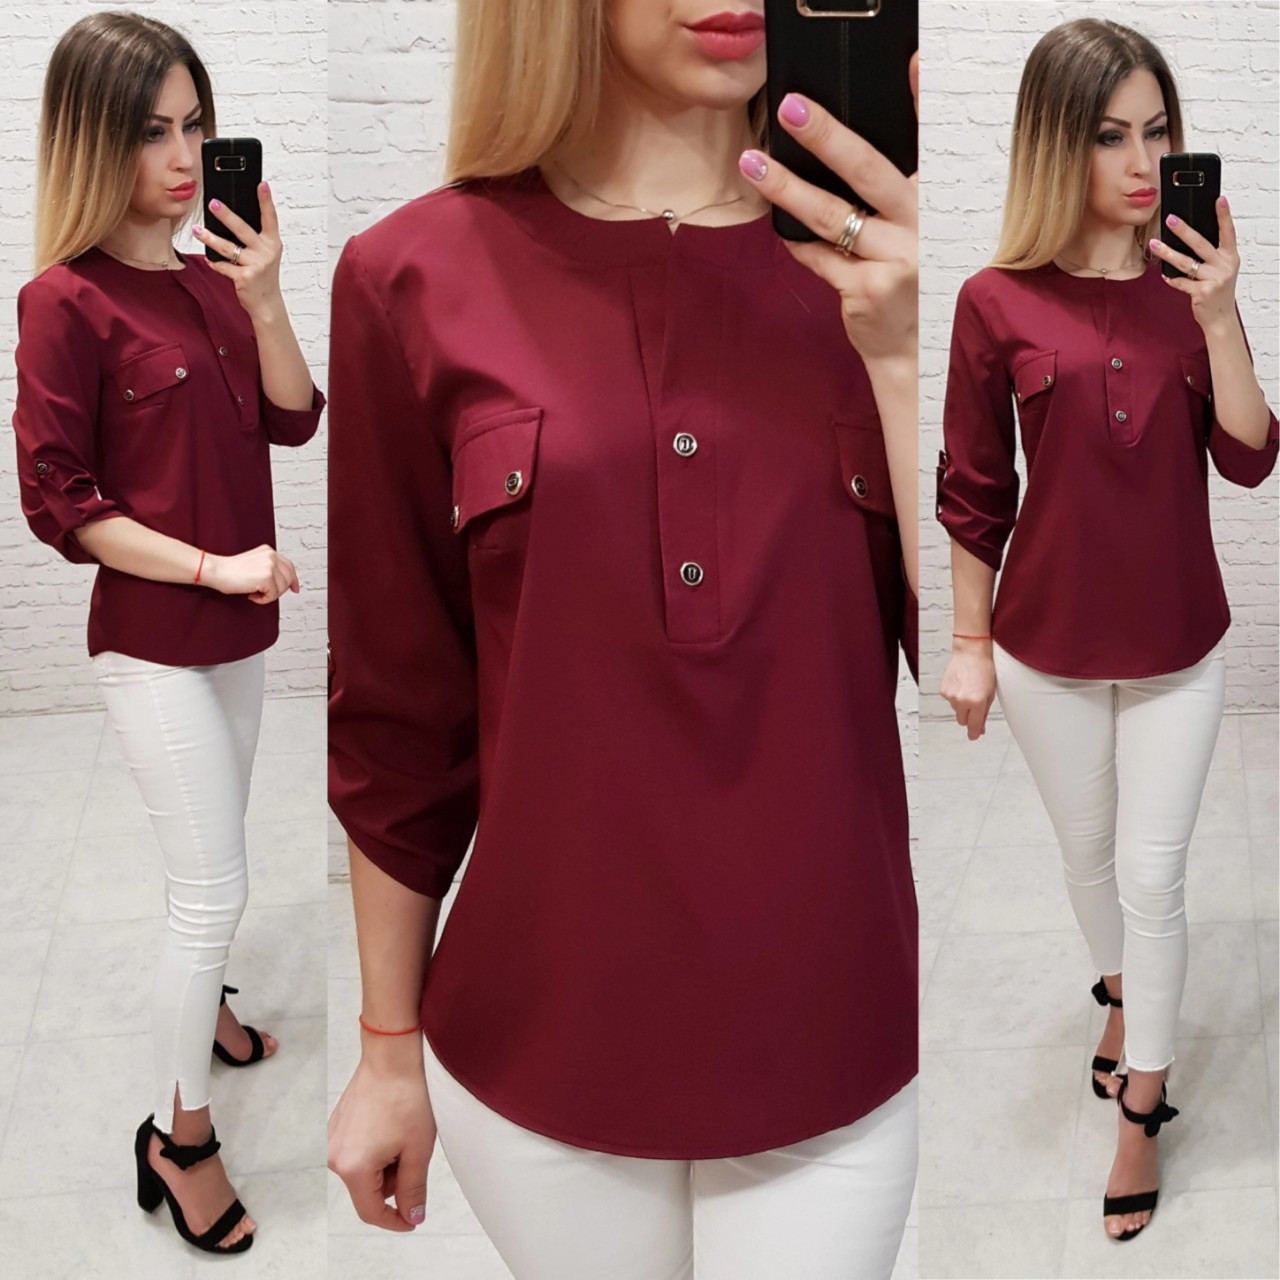 Блузка/блуза з кишеньками на грудях, модель 829 , колір марсала